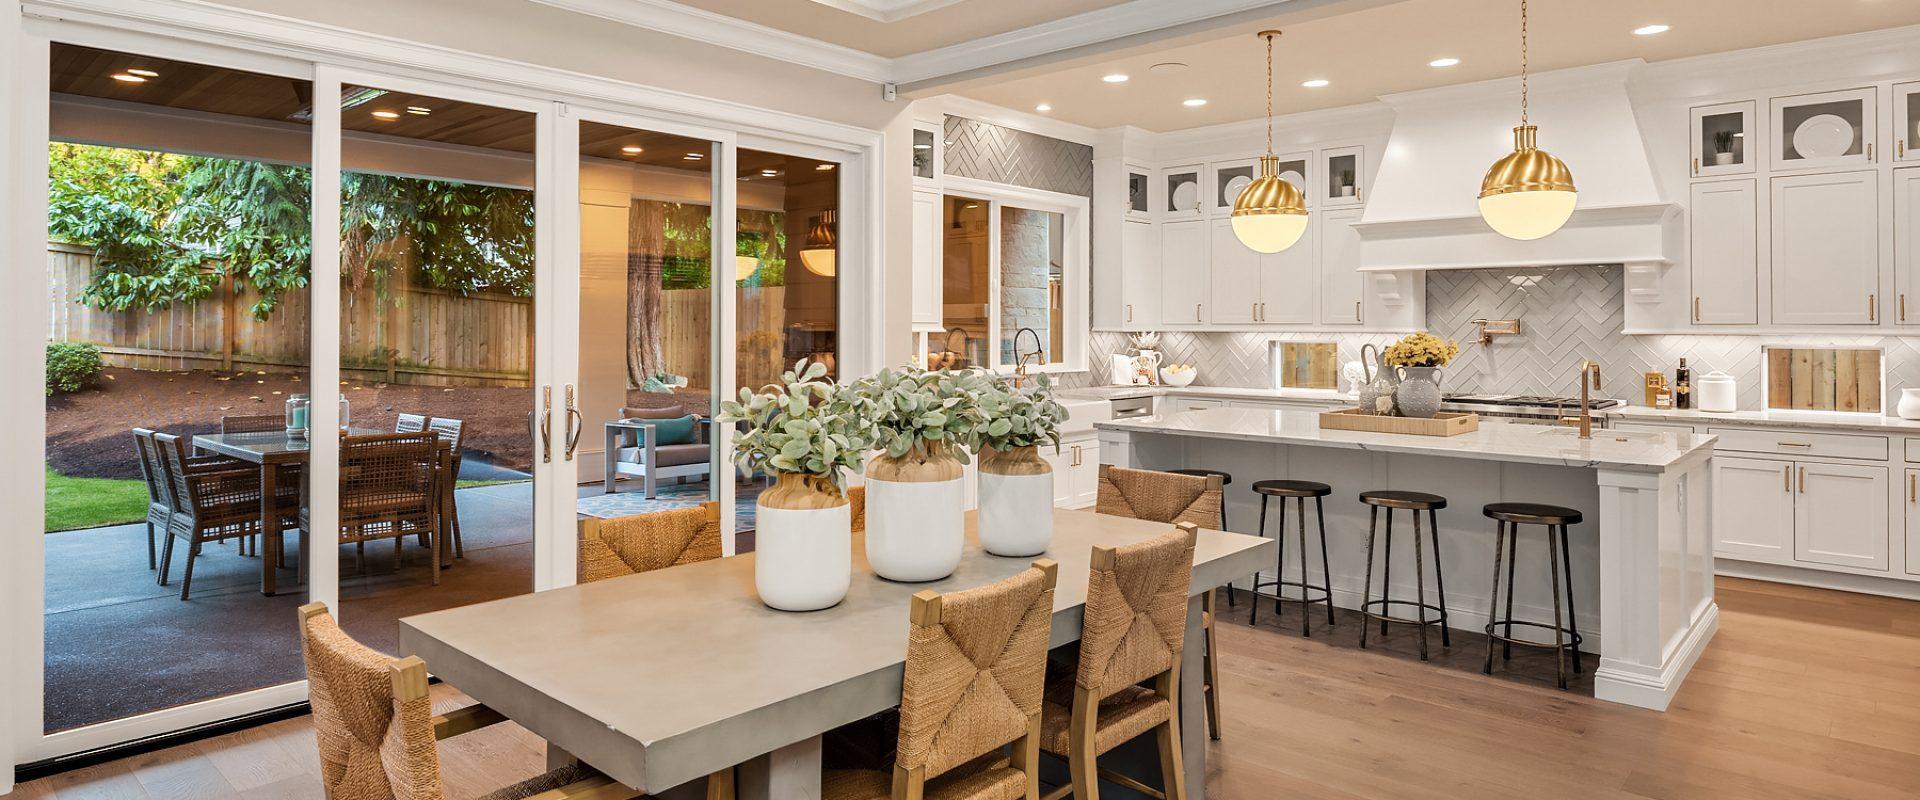 193-13-2126 104th PL SE-bellevue-wa-mn-custom-homes-kitchen